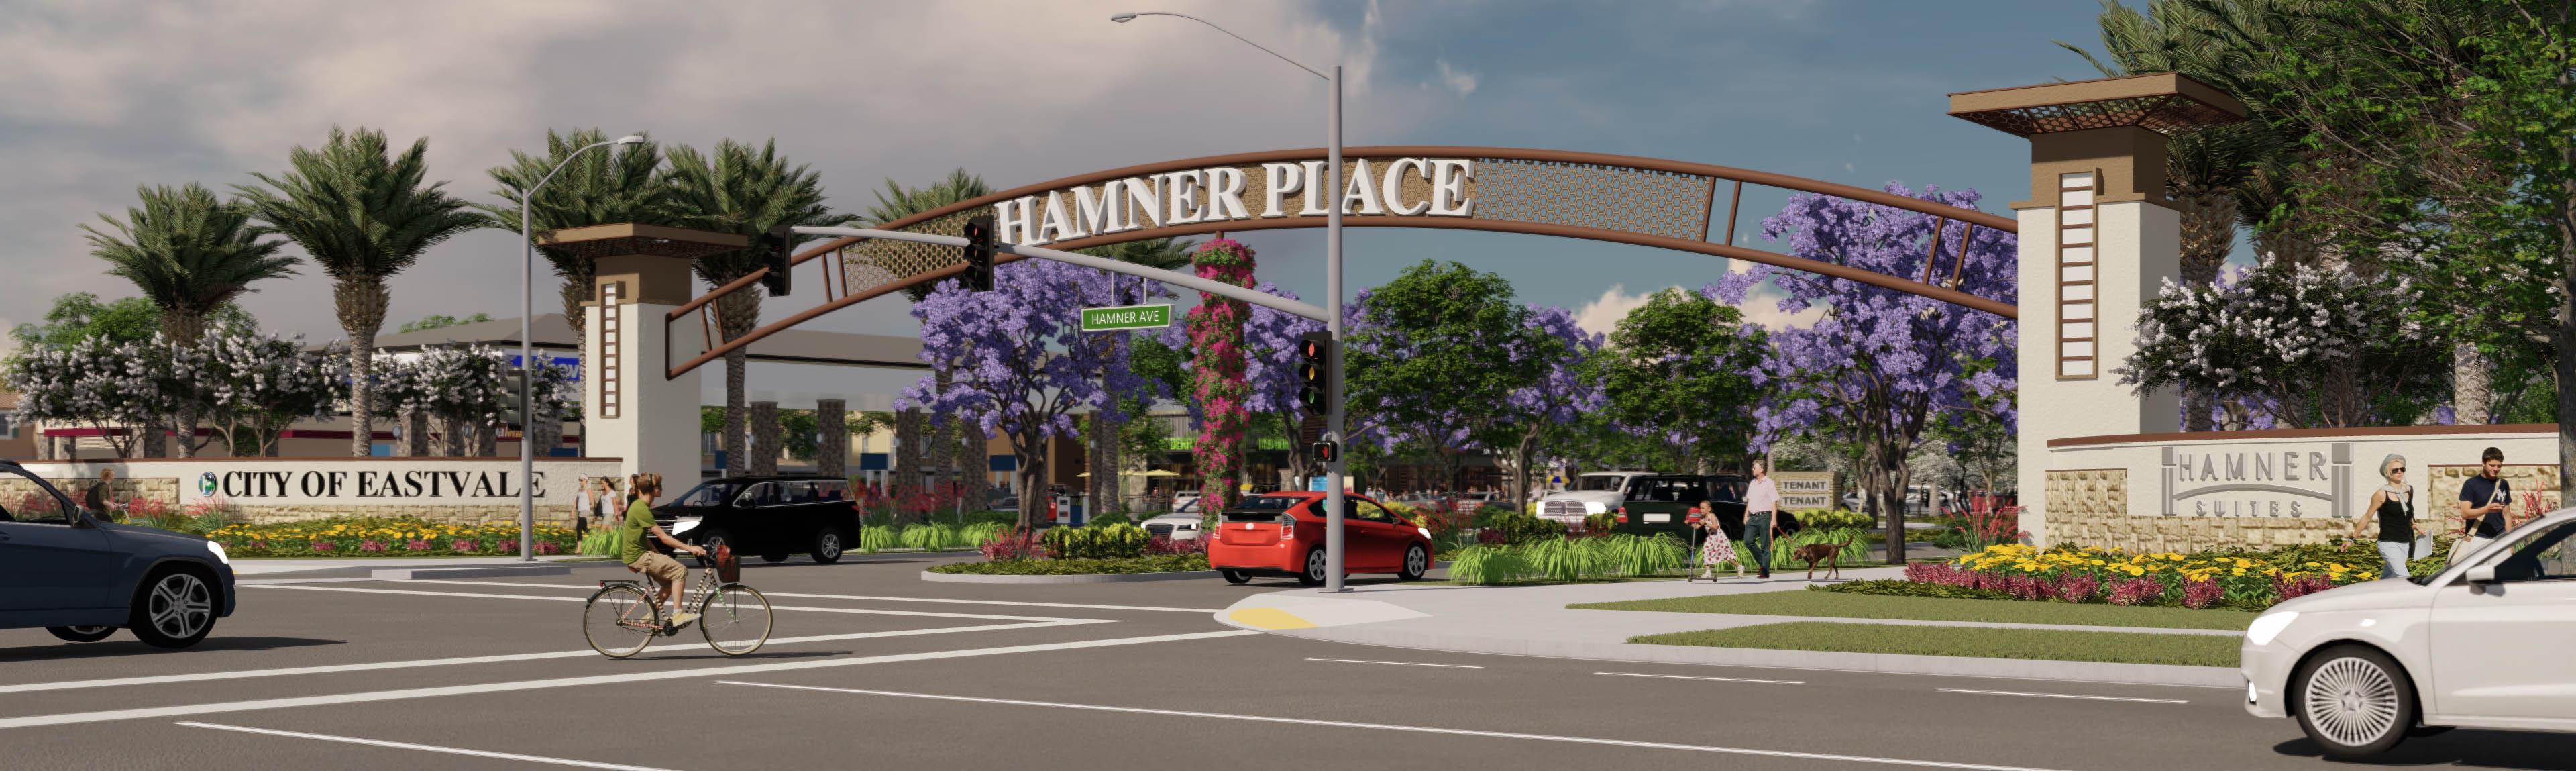 Hamner Place Eastvale